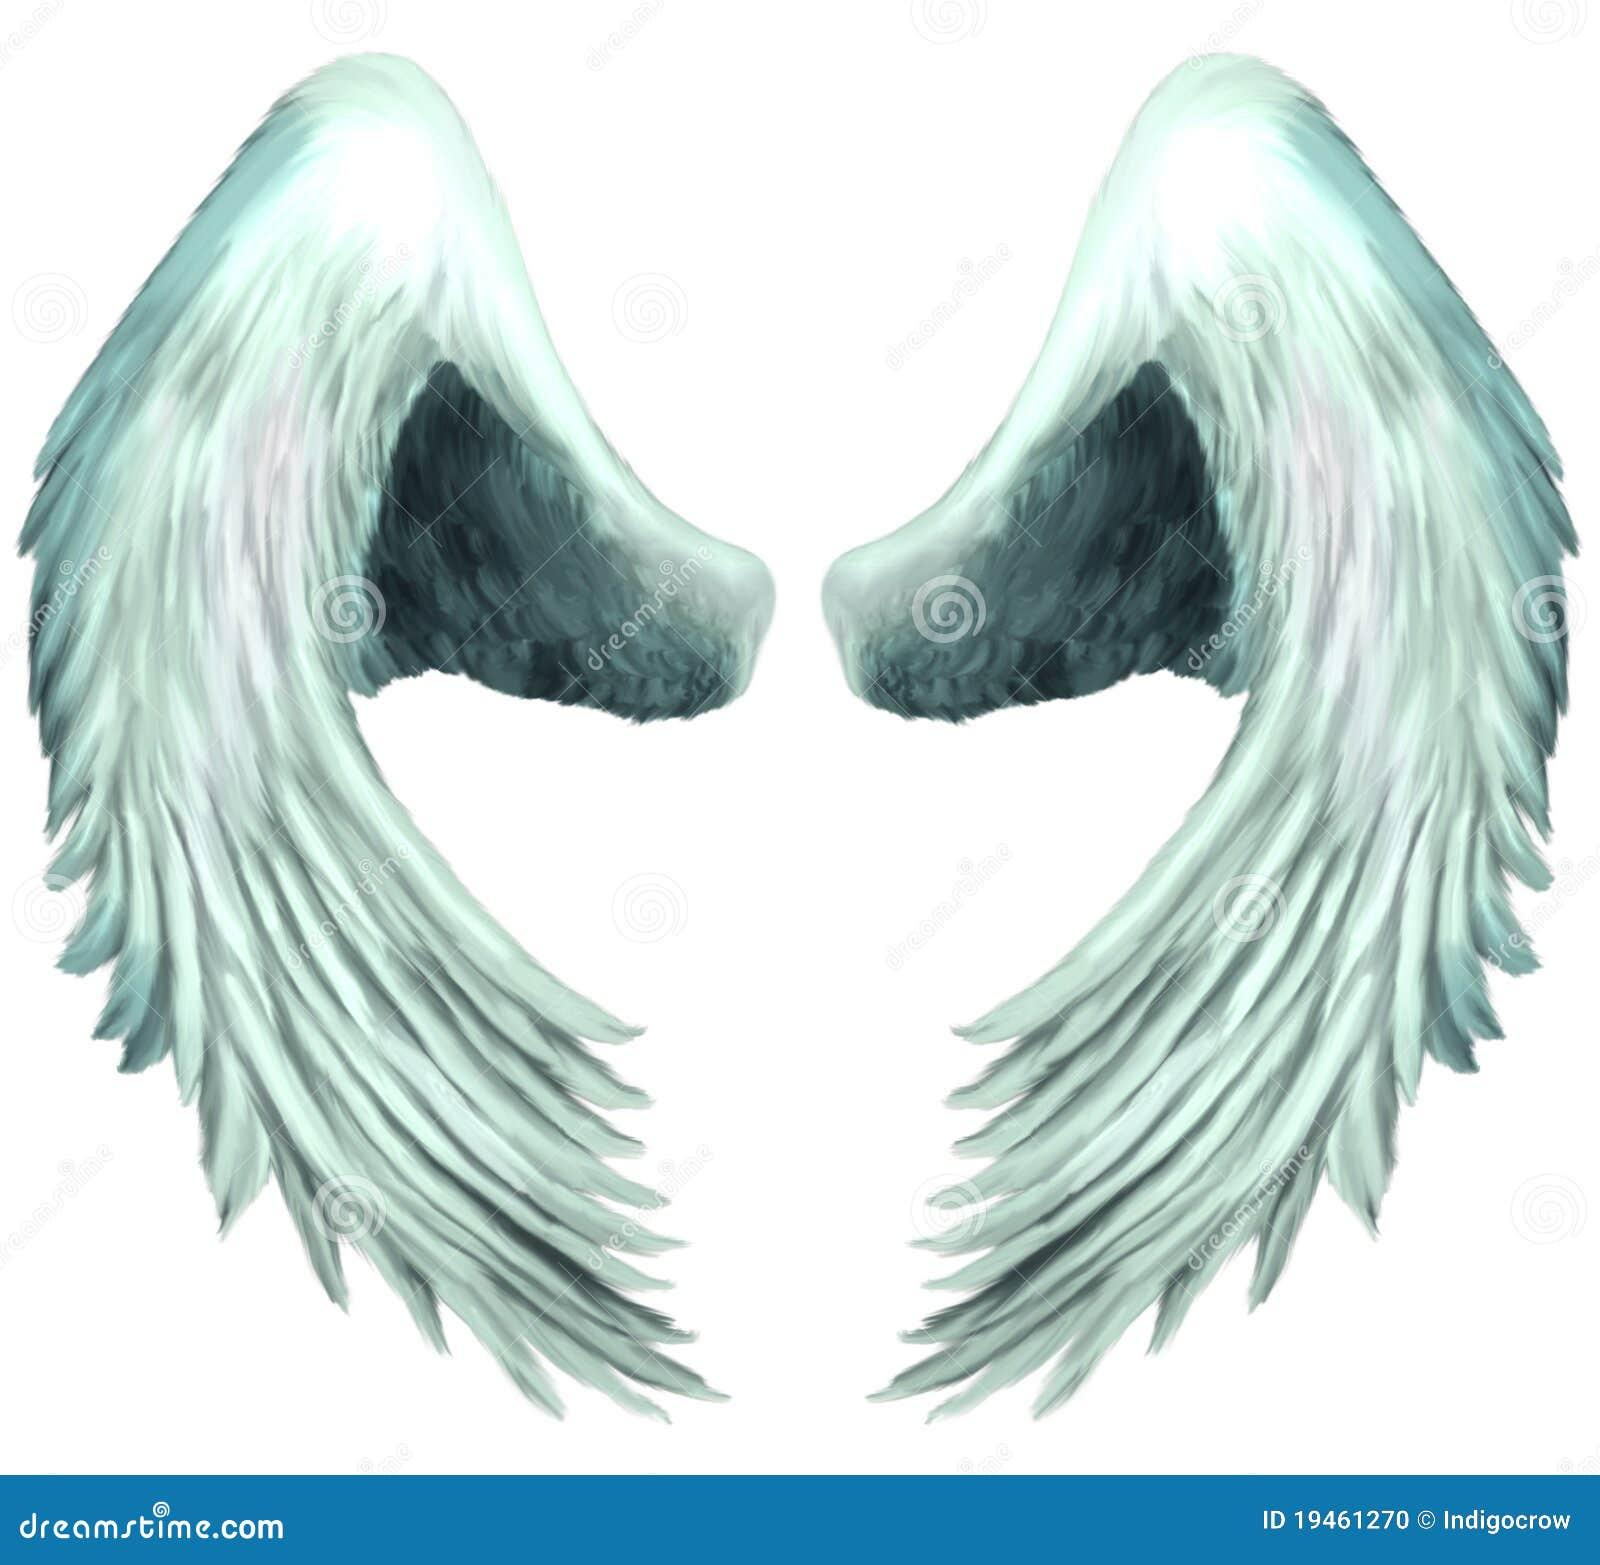 http://thumbs.dreamstime.com/z/%CF%86%CF%84%CE%B5%CF%81%CE%AC-1-%CE%B1%CE%B3%CE%B3%CE%AD%CE%BB%CE%BF%CF%85-seraphim-19461270.jpg